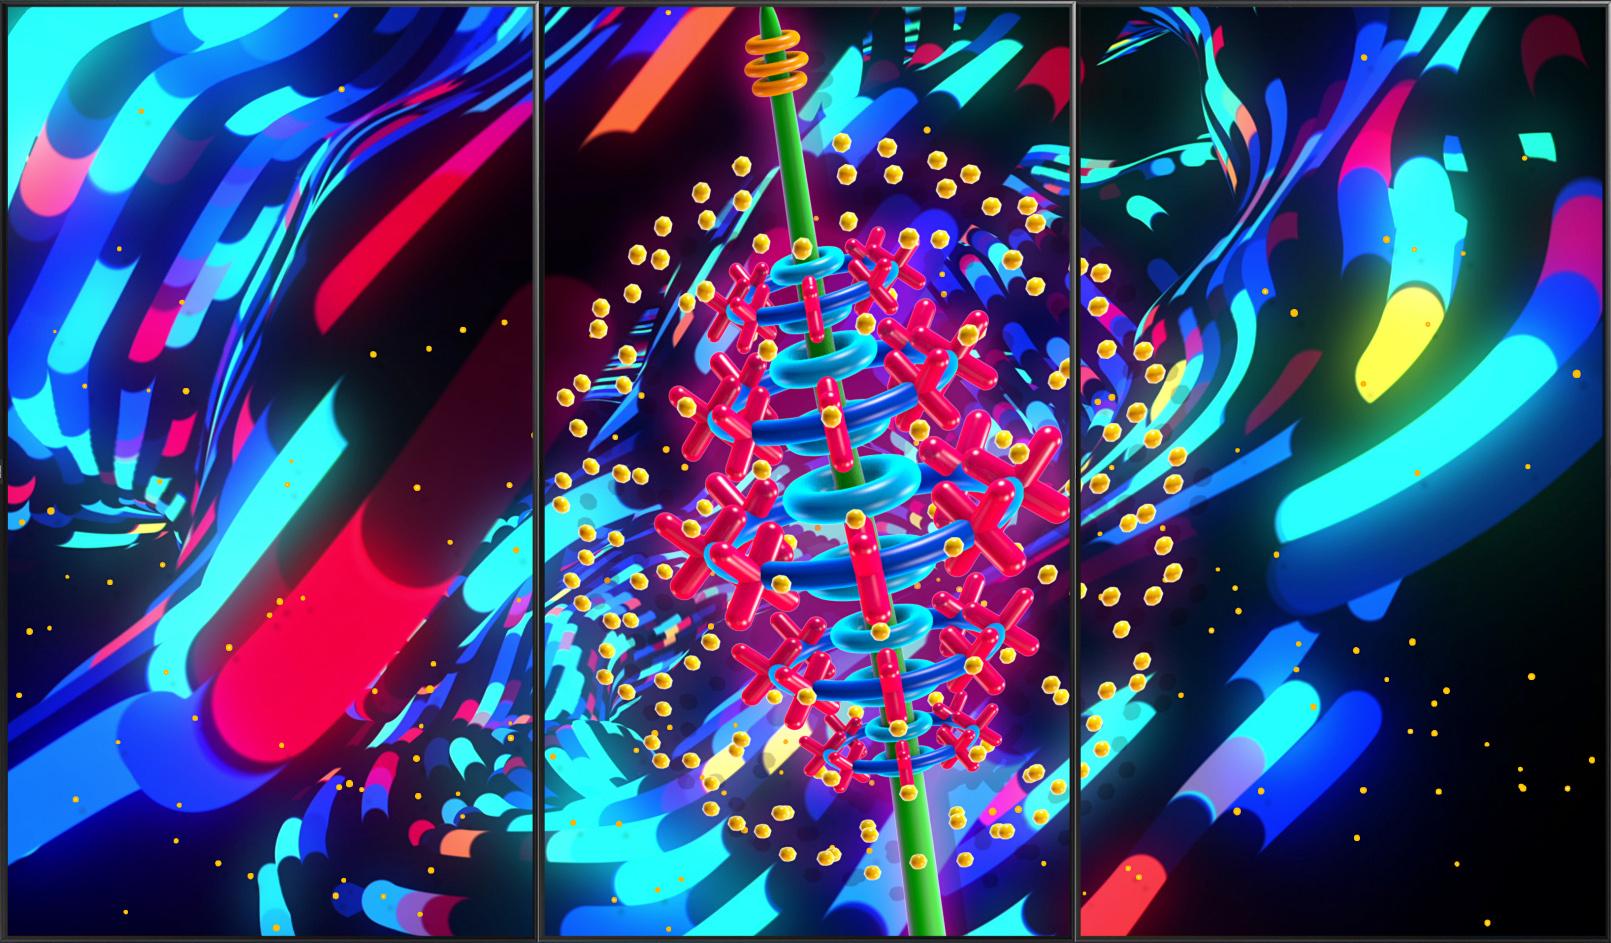 blossom_0006_Blossom - Sample Image - 8.jpg